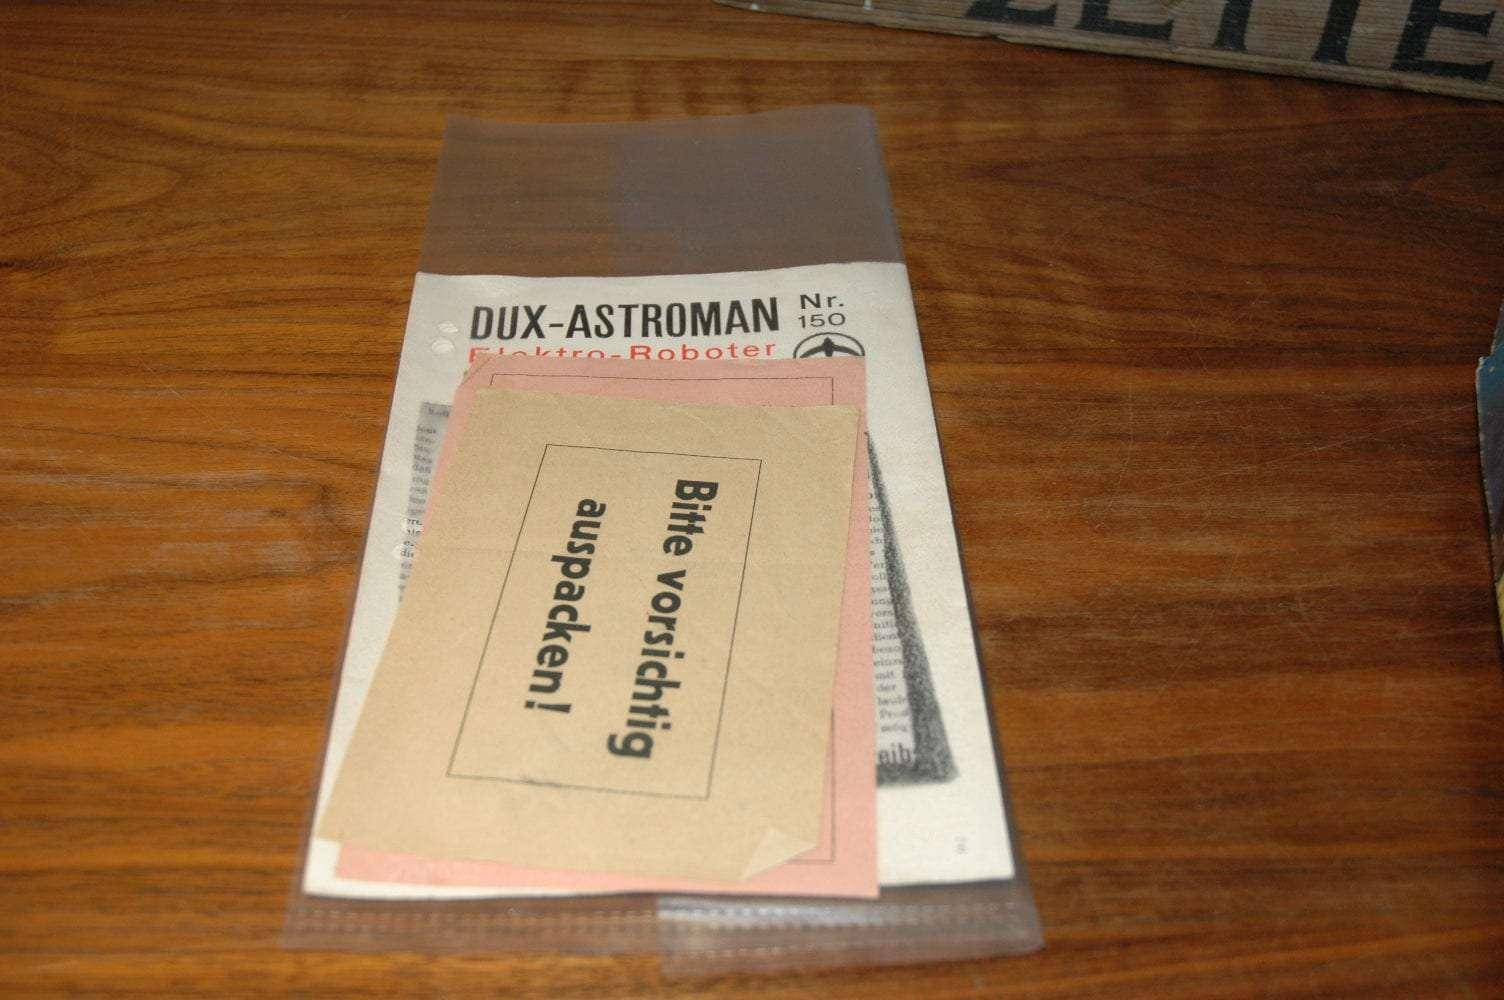 DUX - Astroman